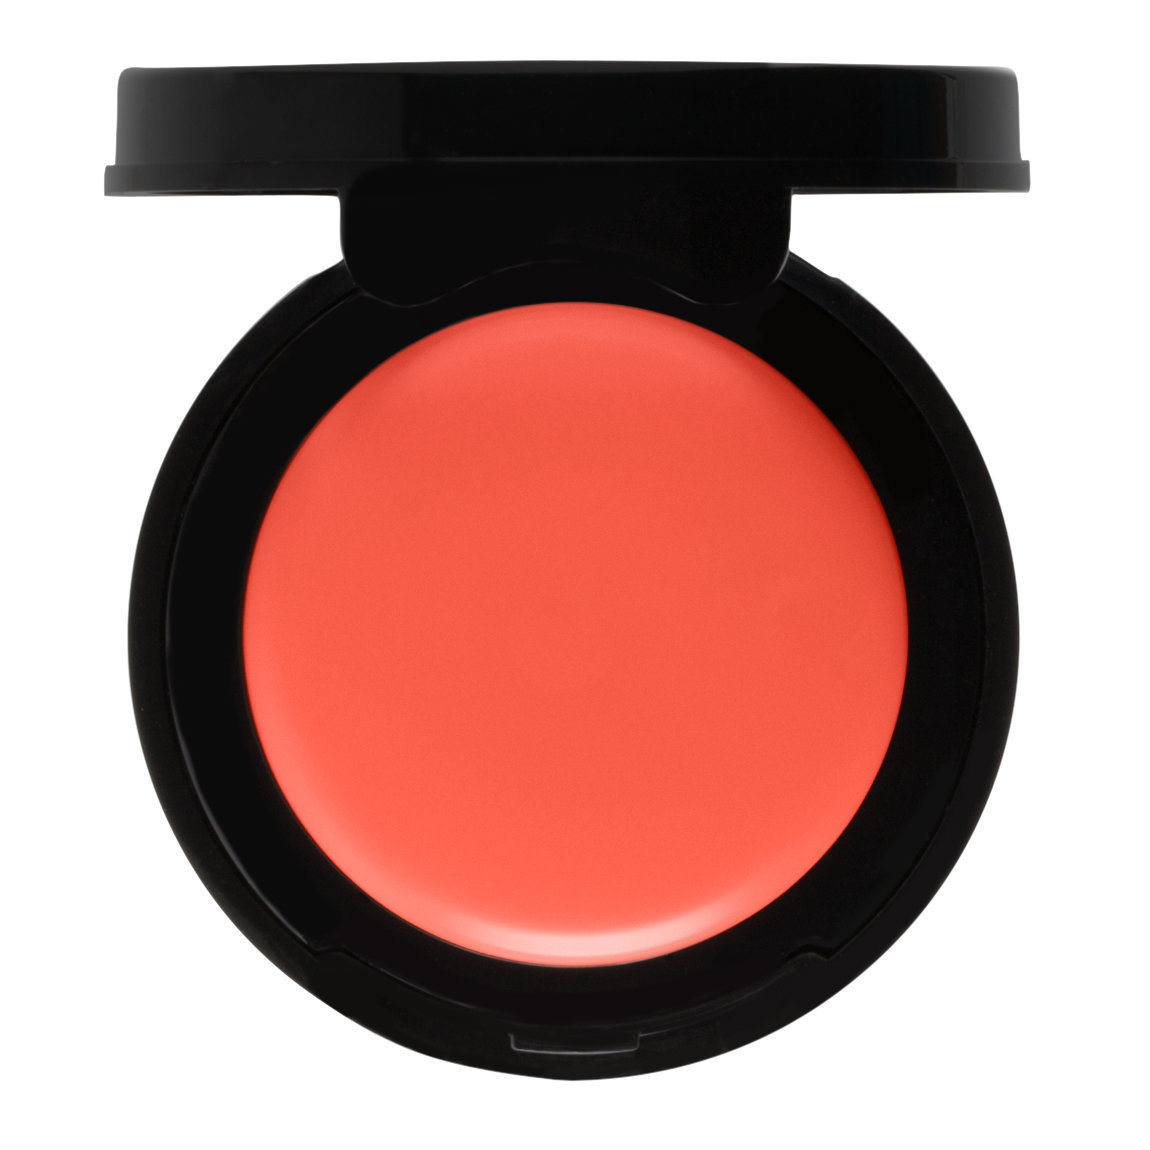 Make-Up Atelier Blush Cream LBC Coral alternative view 1.